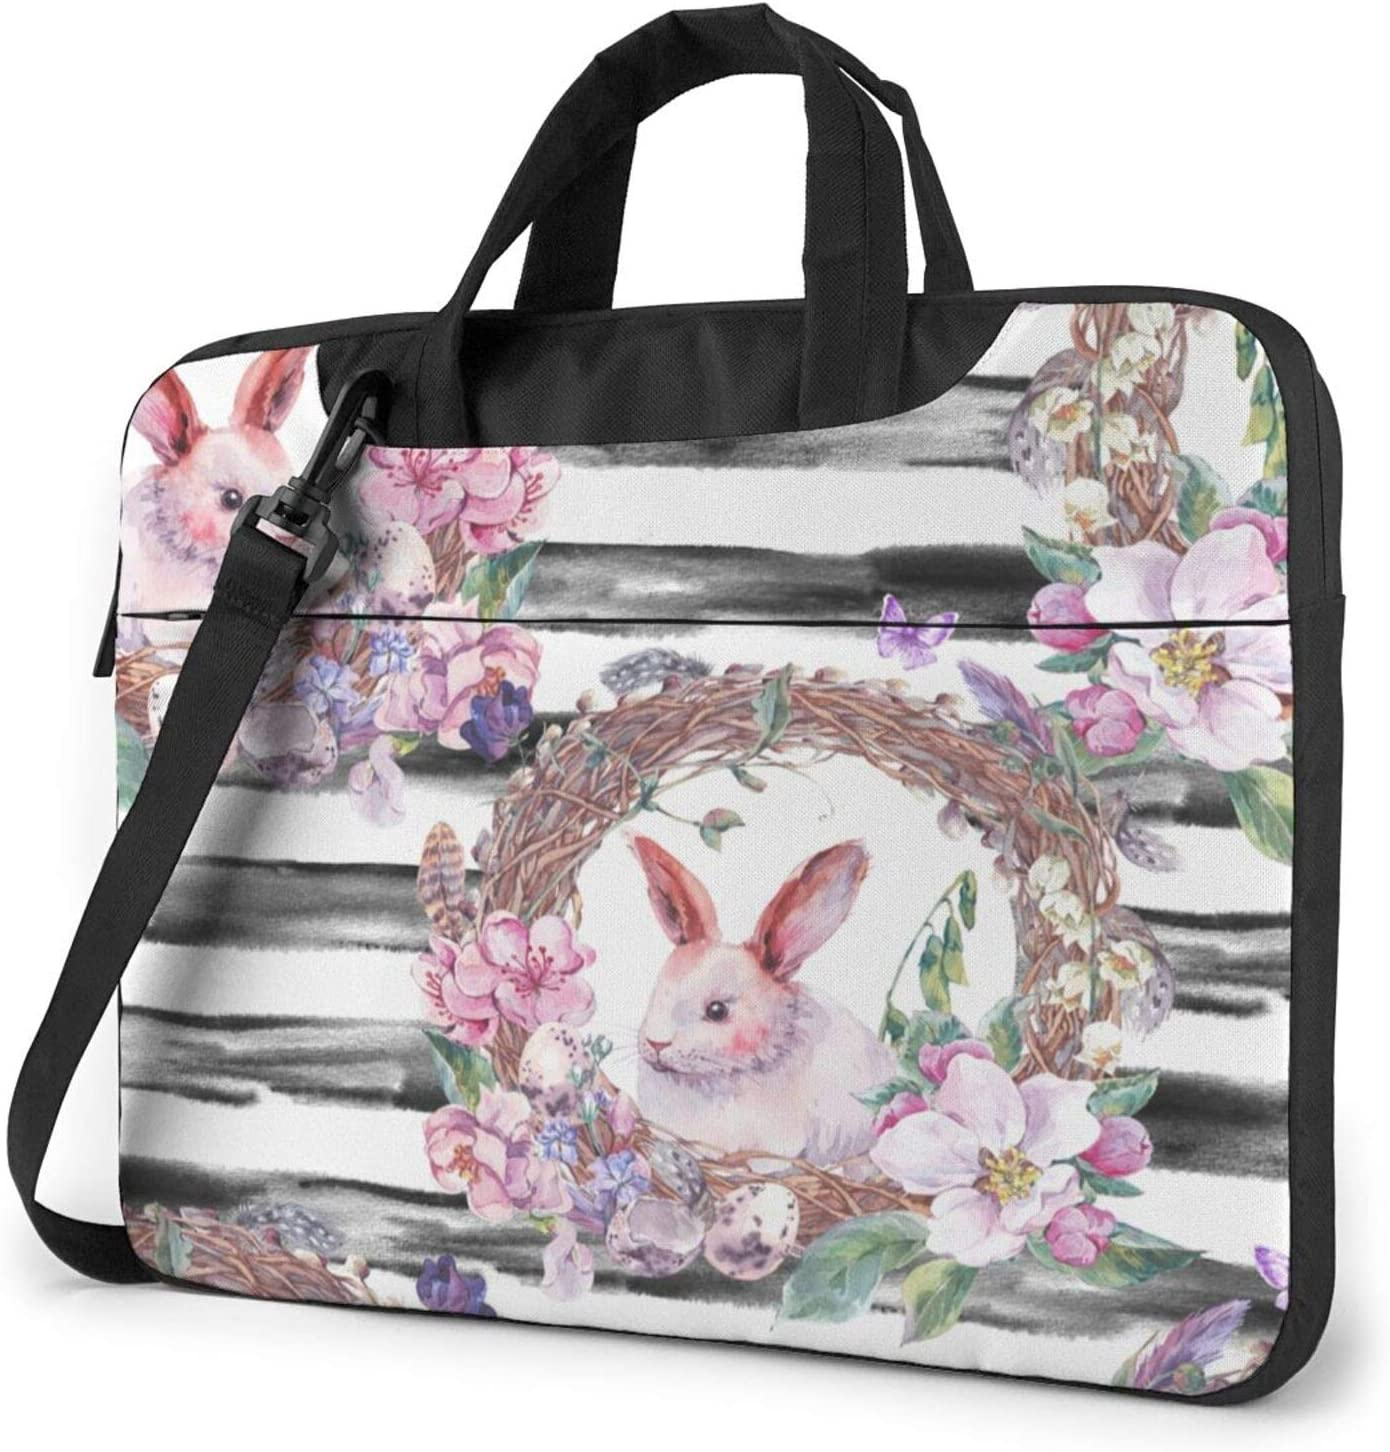 Laptop Messenger Spring Happy Easter Bunny Shoulder Bag Briefcase Office Laptop Sleeve Case Luggage for Men Women 15.6 Inch